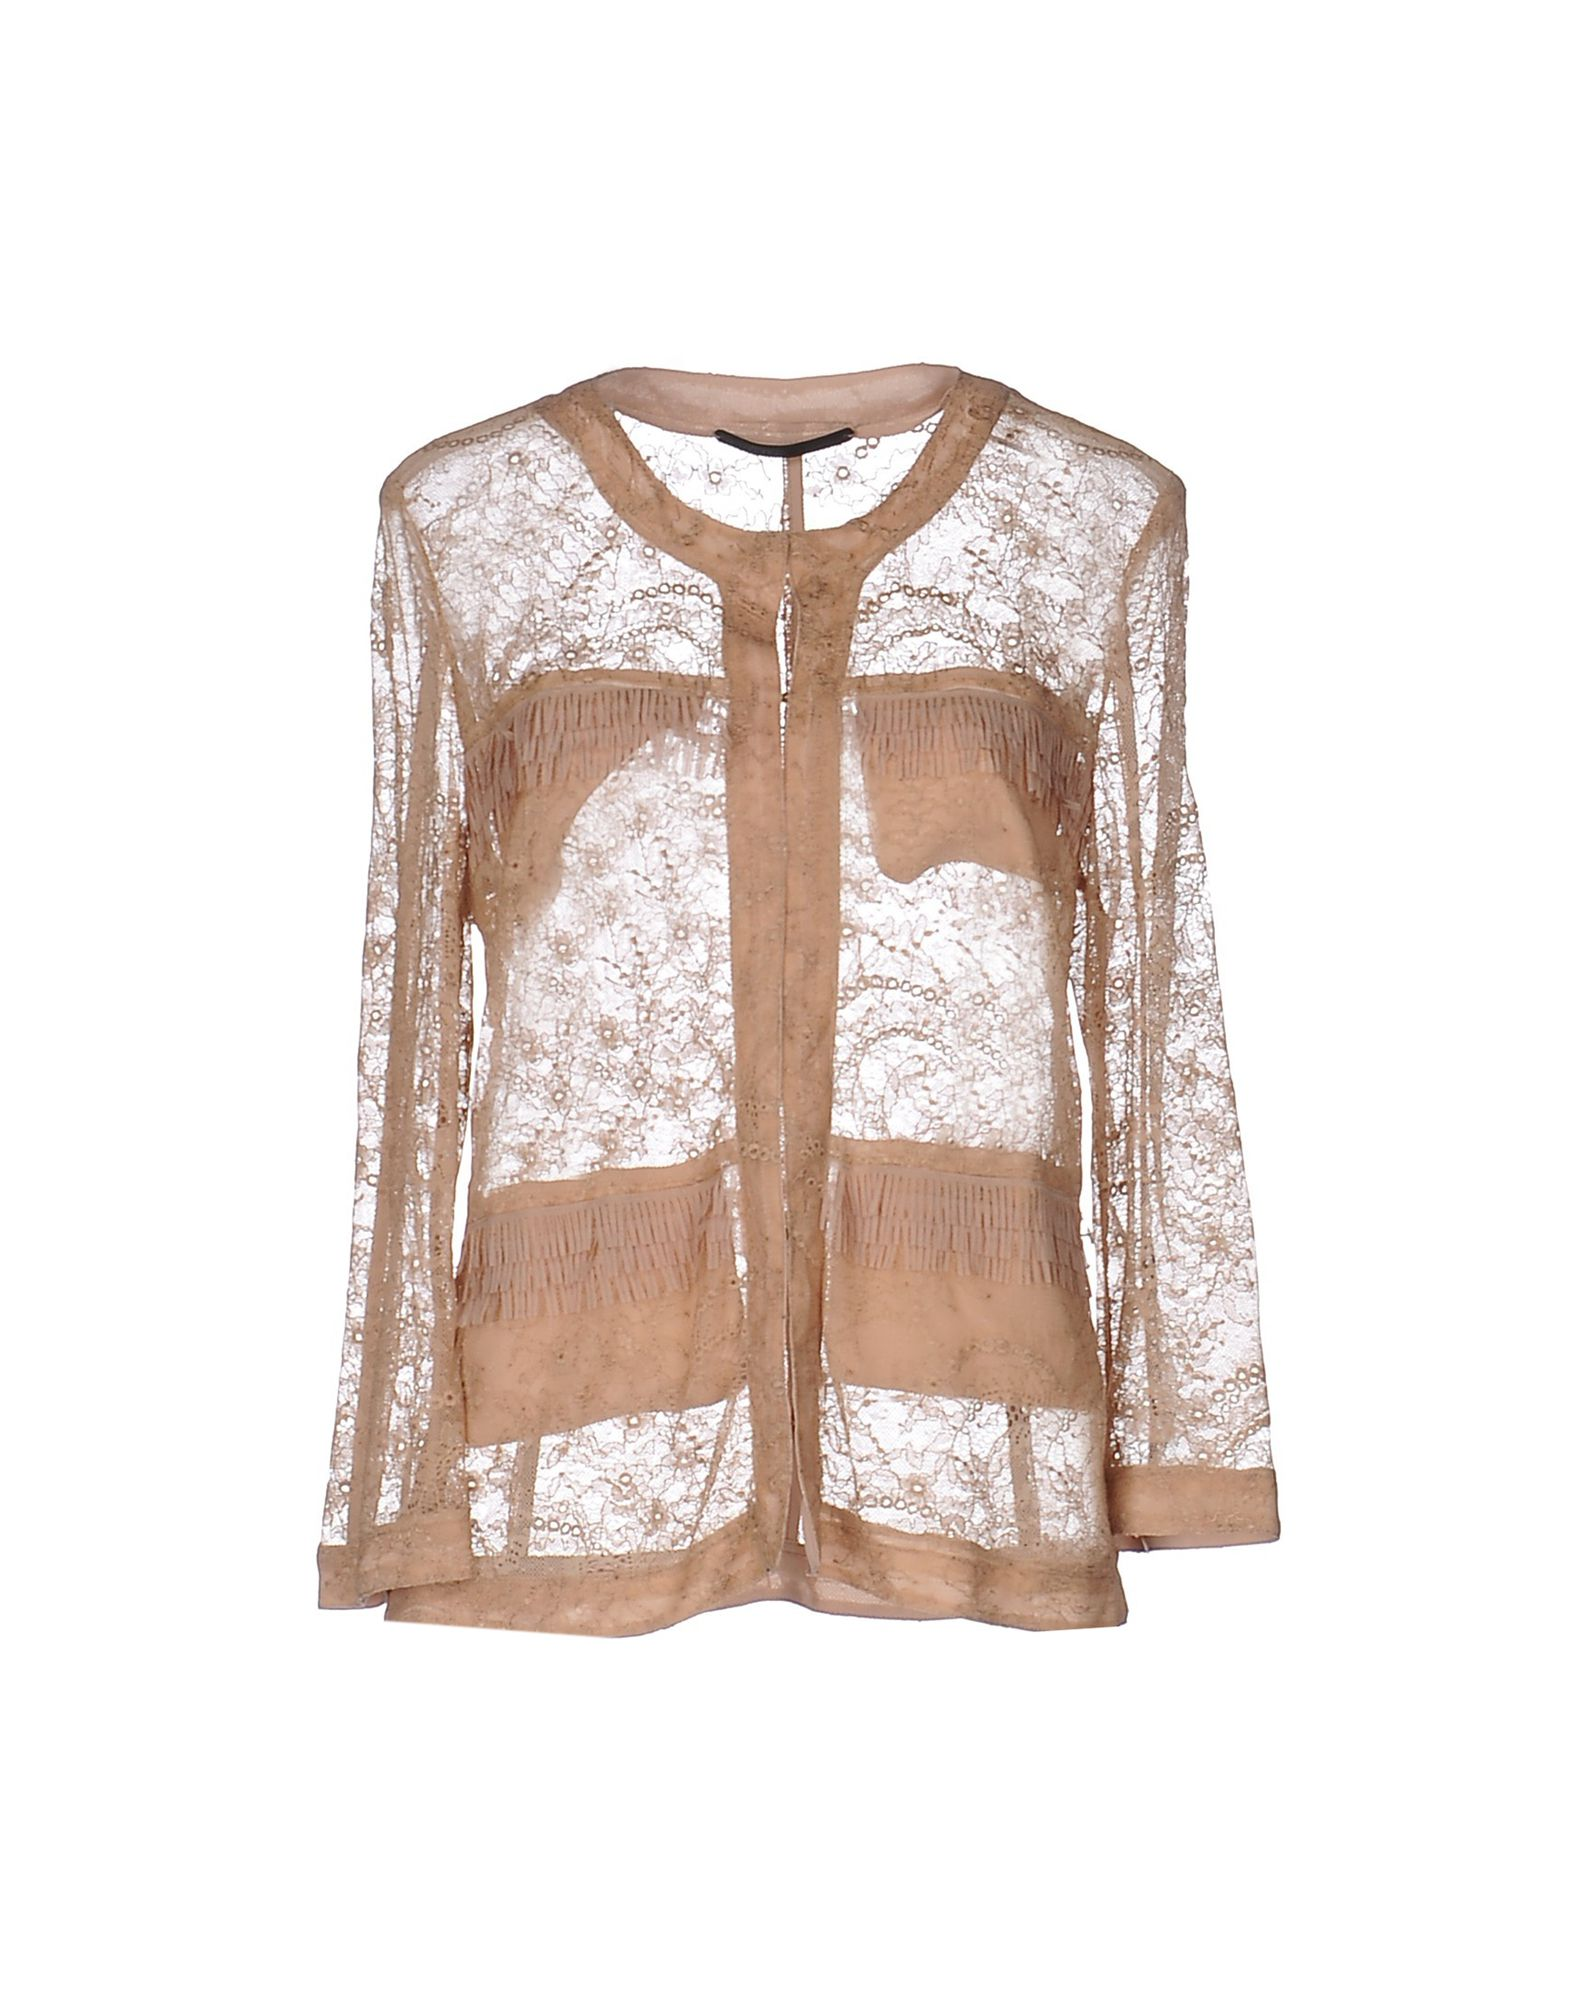 ATOS LOMBARDINI Blazer in Pale Pink